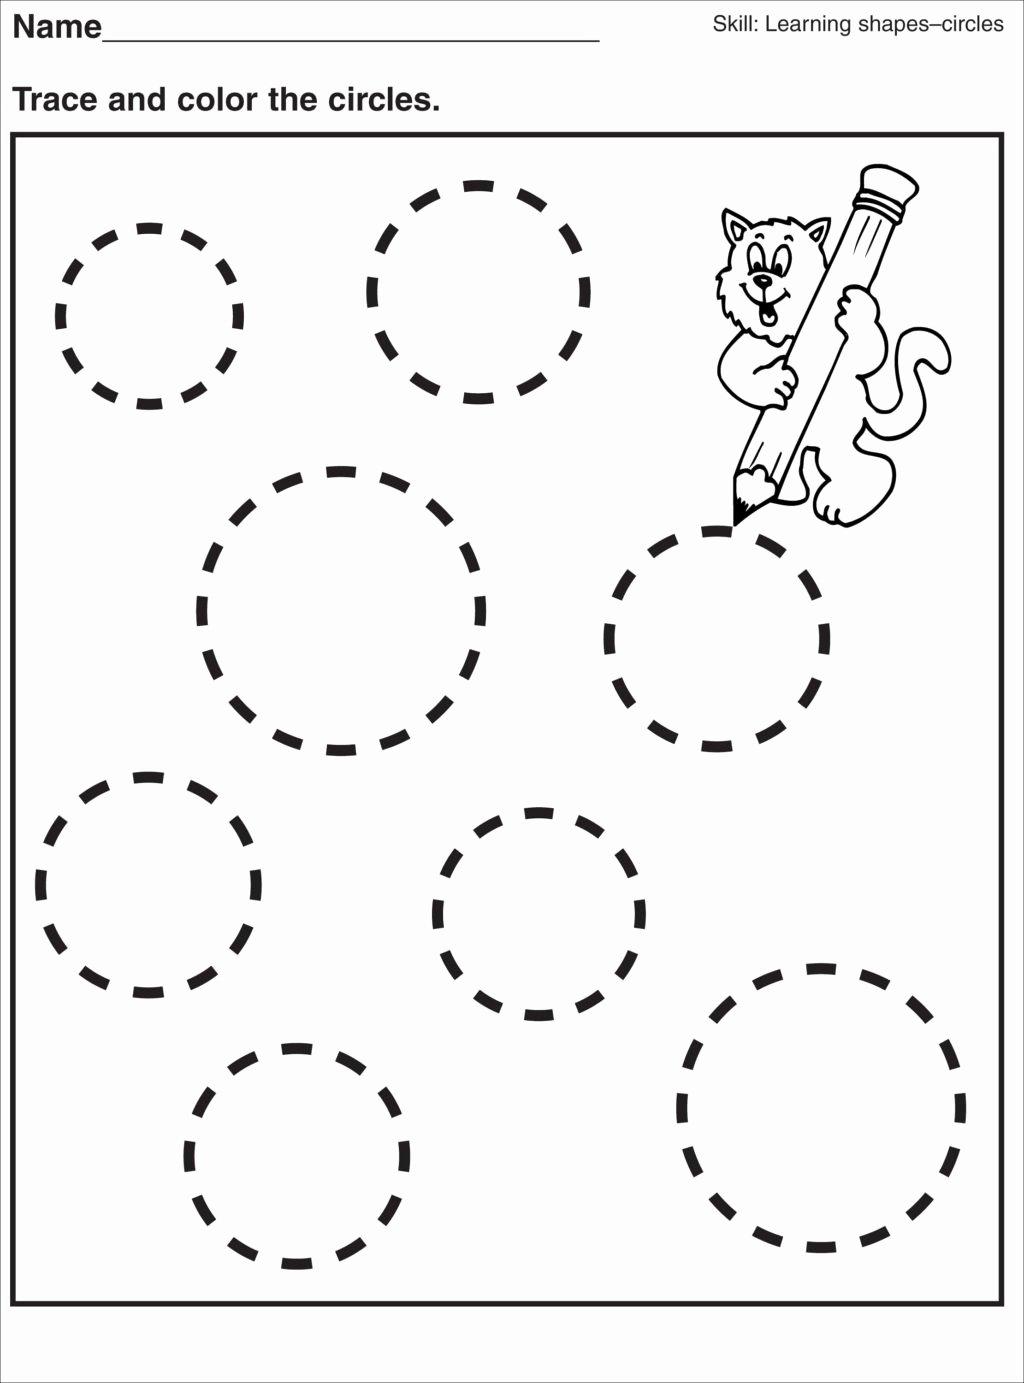 Activity Worksheets for Preschoolers Ideas Worksheet Activity Worksheets for Preschoolers Image